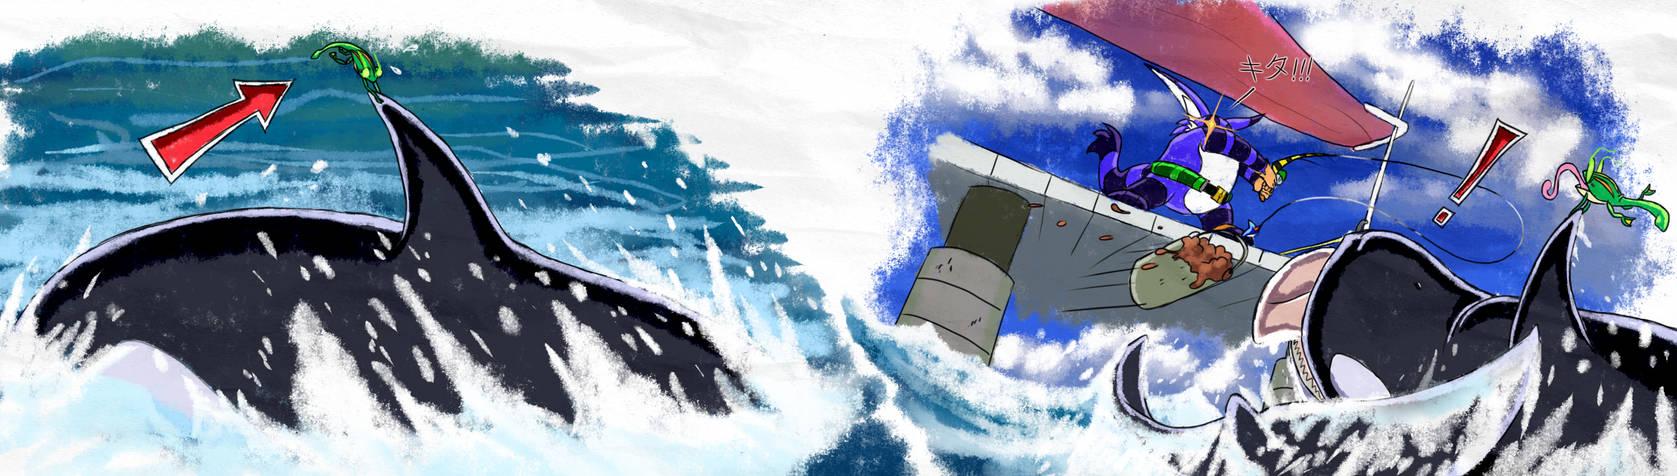 Big vs Whale - SA1 Remake Fan Concept Art